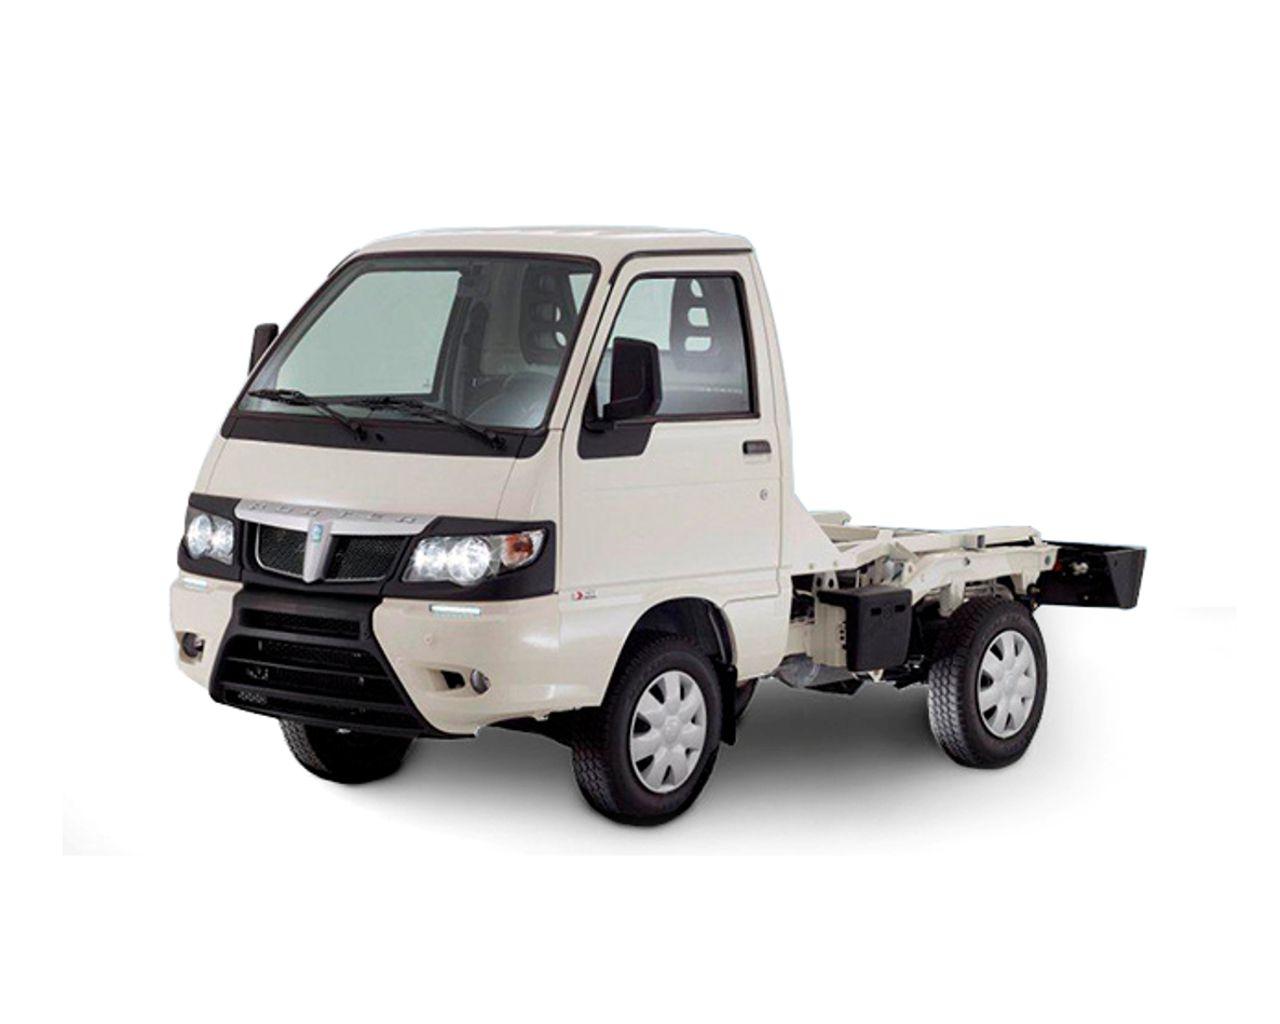 Piaggio Porter Ηλεκτρικό Chassis- Α. Λιάπης Αντιπροσωπεία